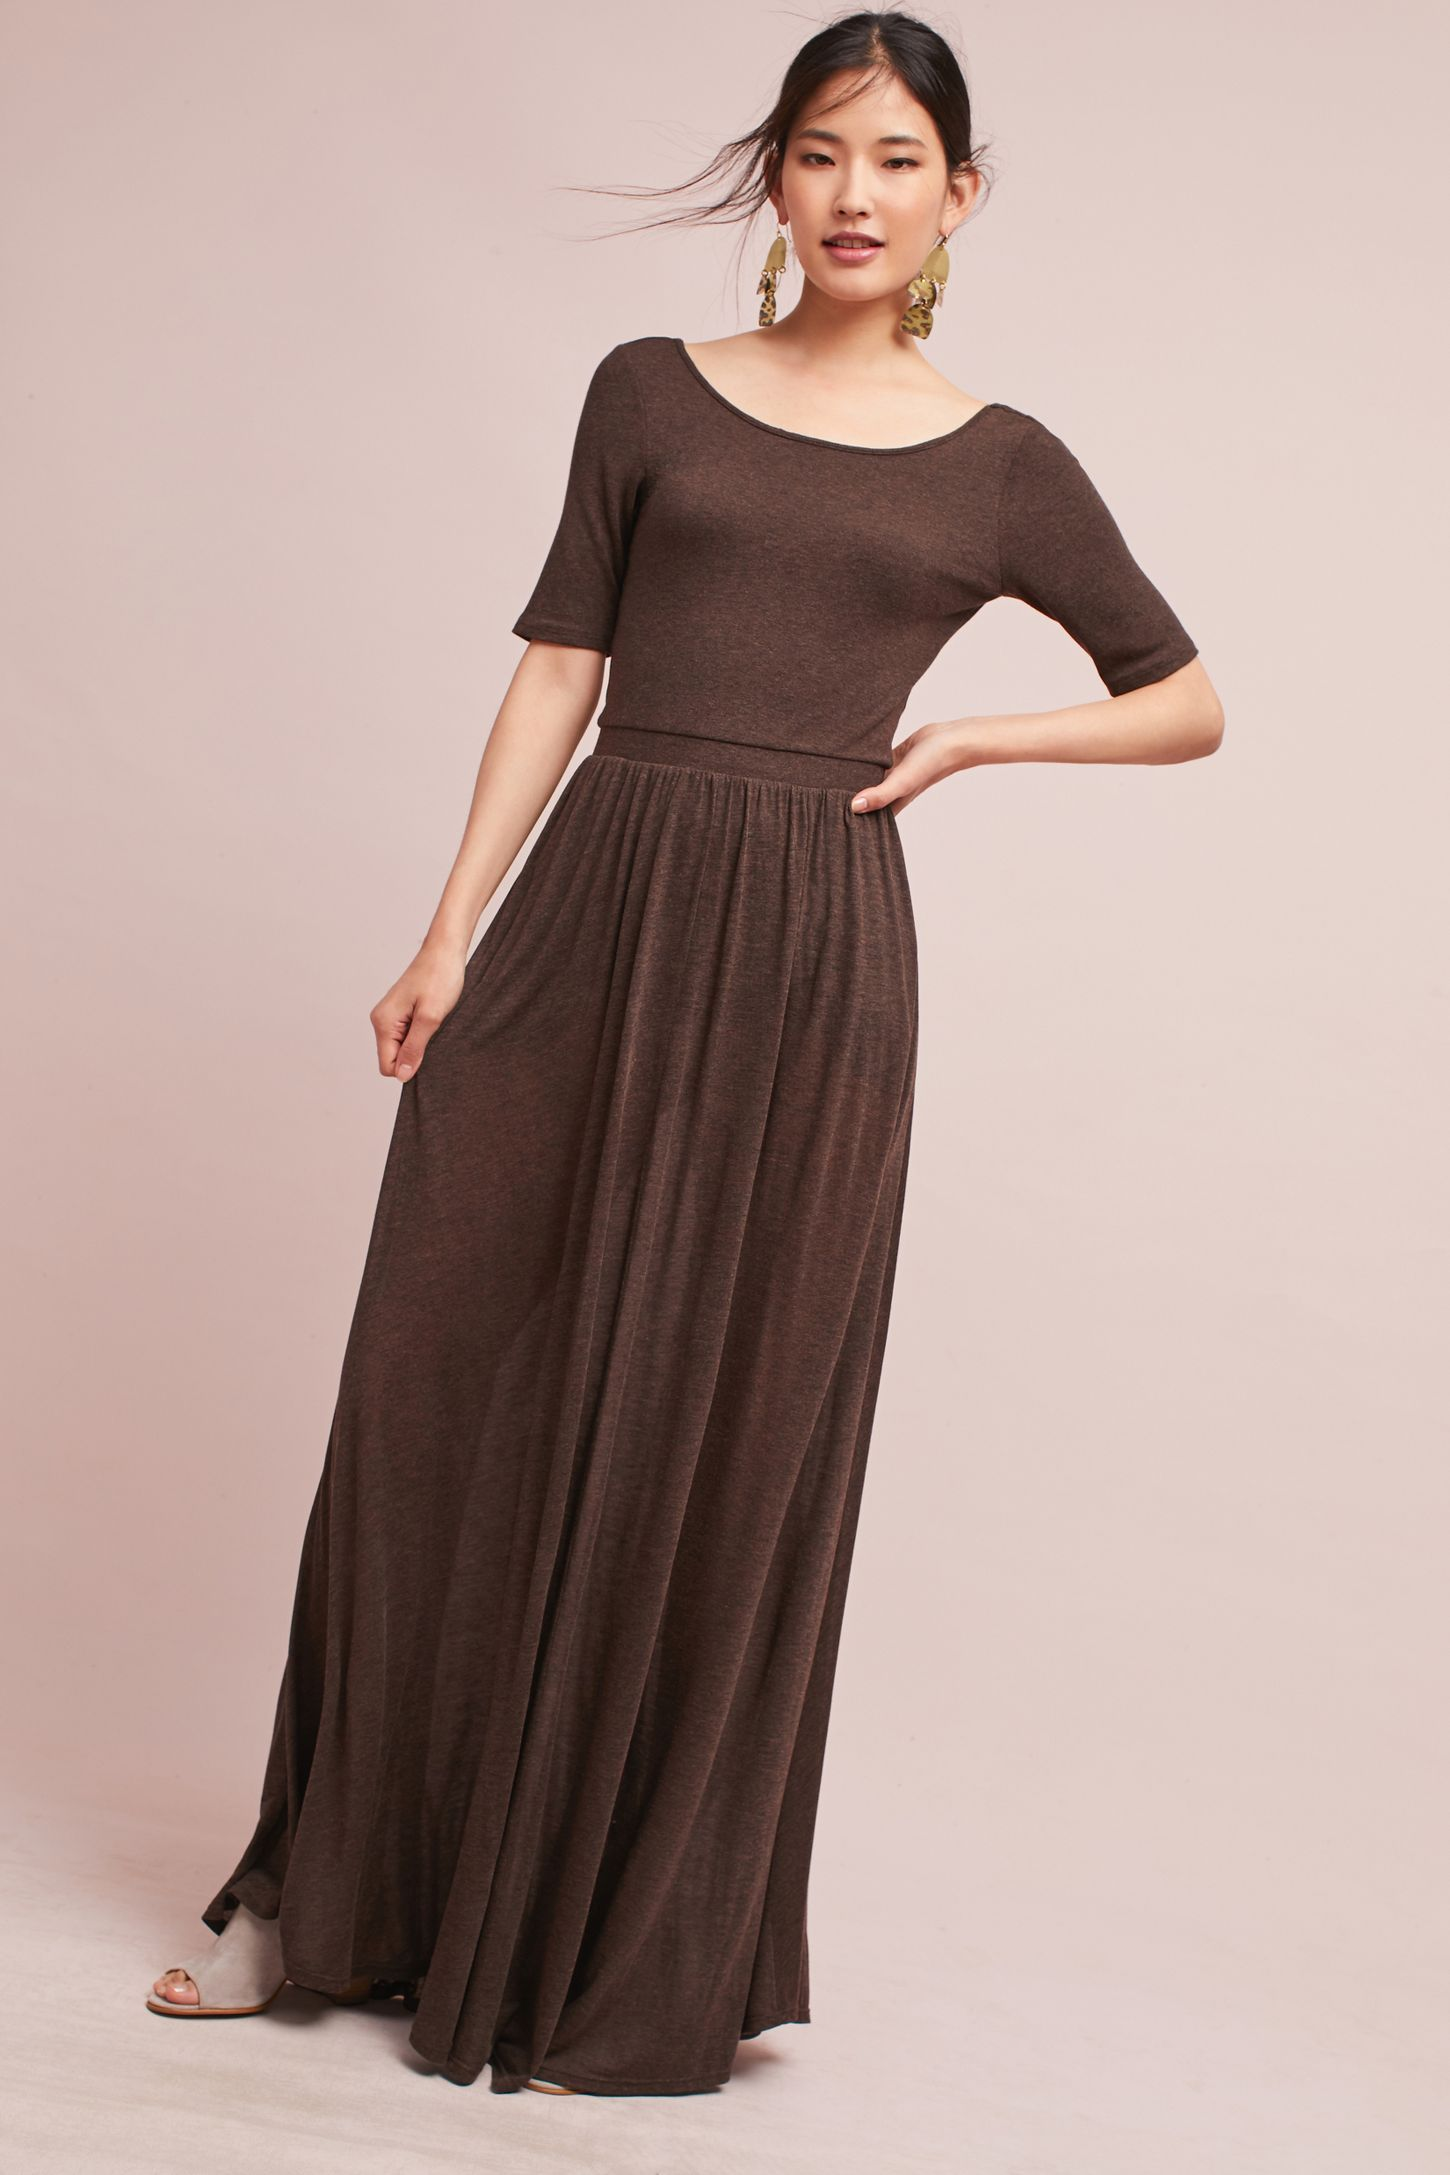 Brown - Dresses For Women   Anthropologie